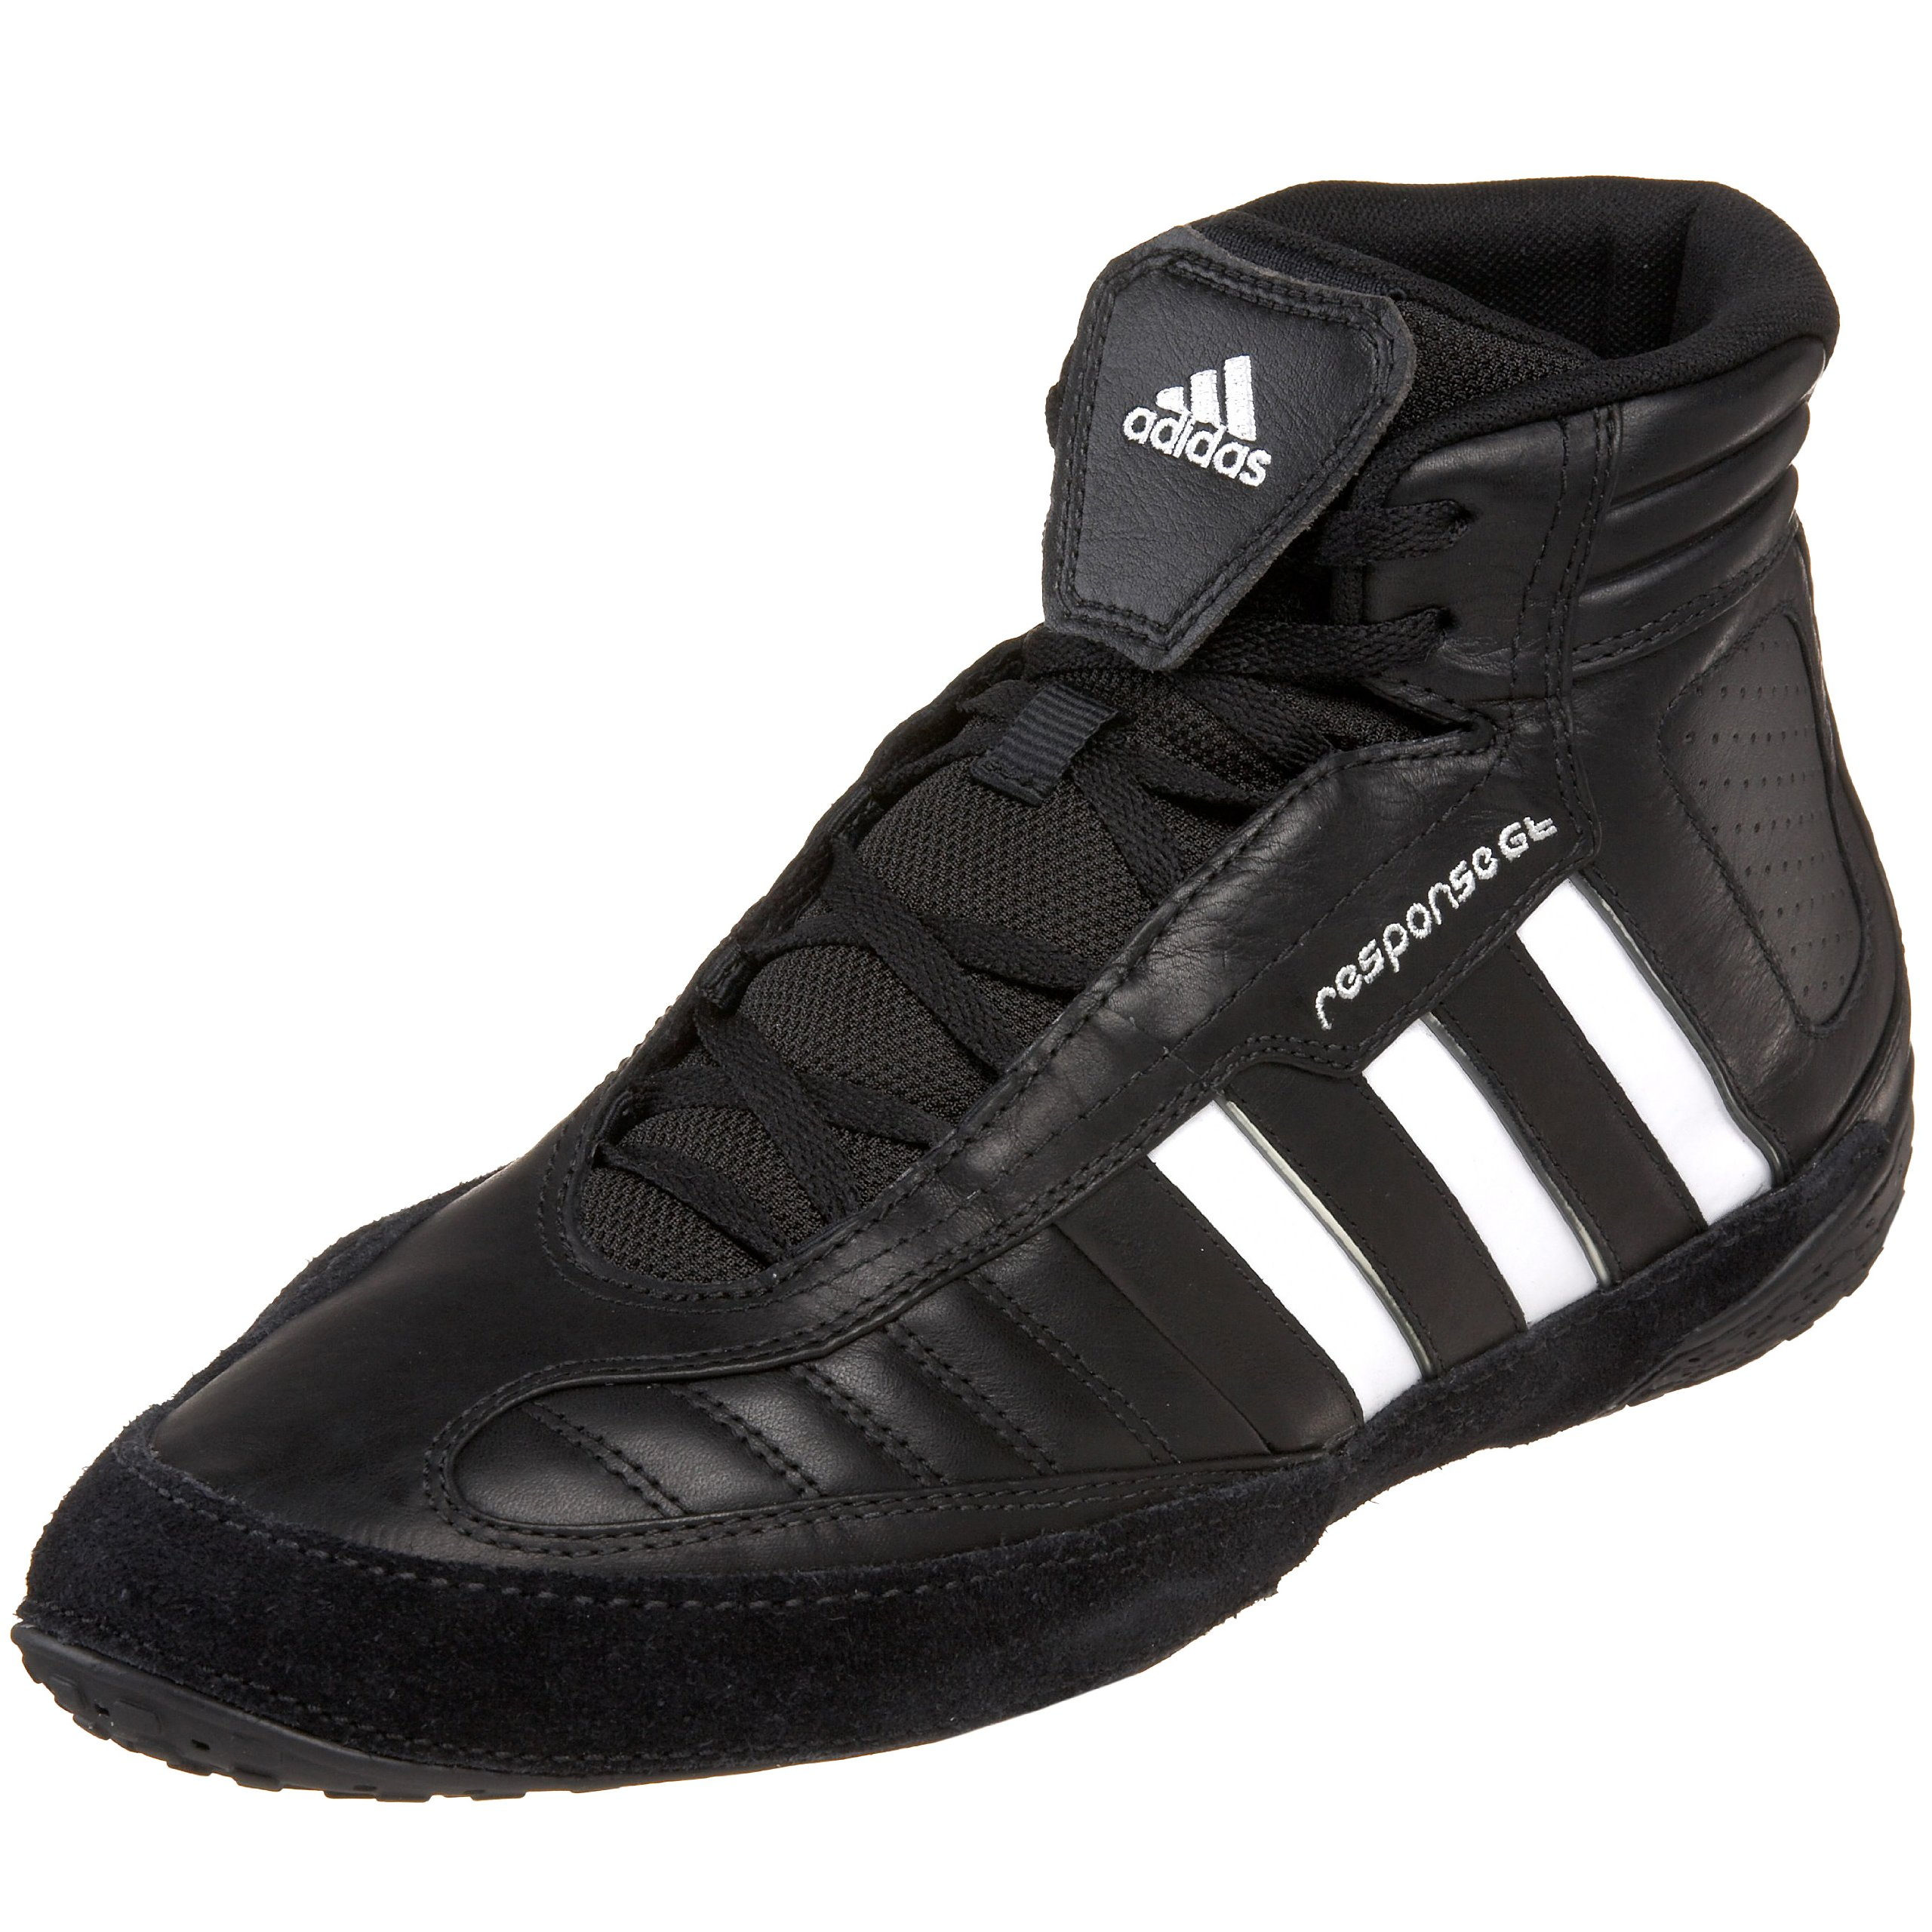 adidas Men's Response Gt Wrestling Shoe,Black/White,12 M US